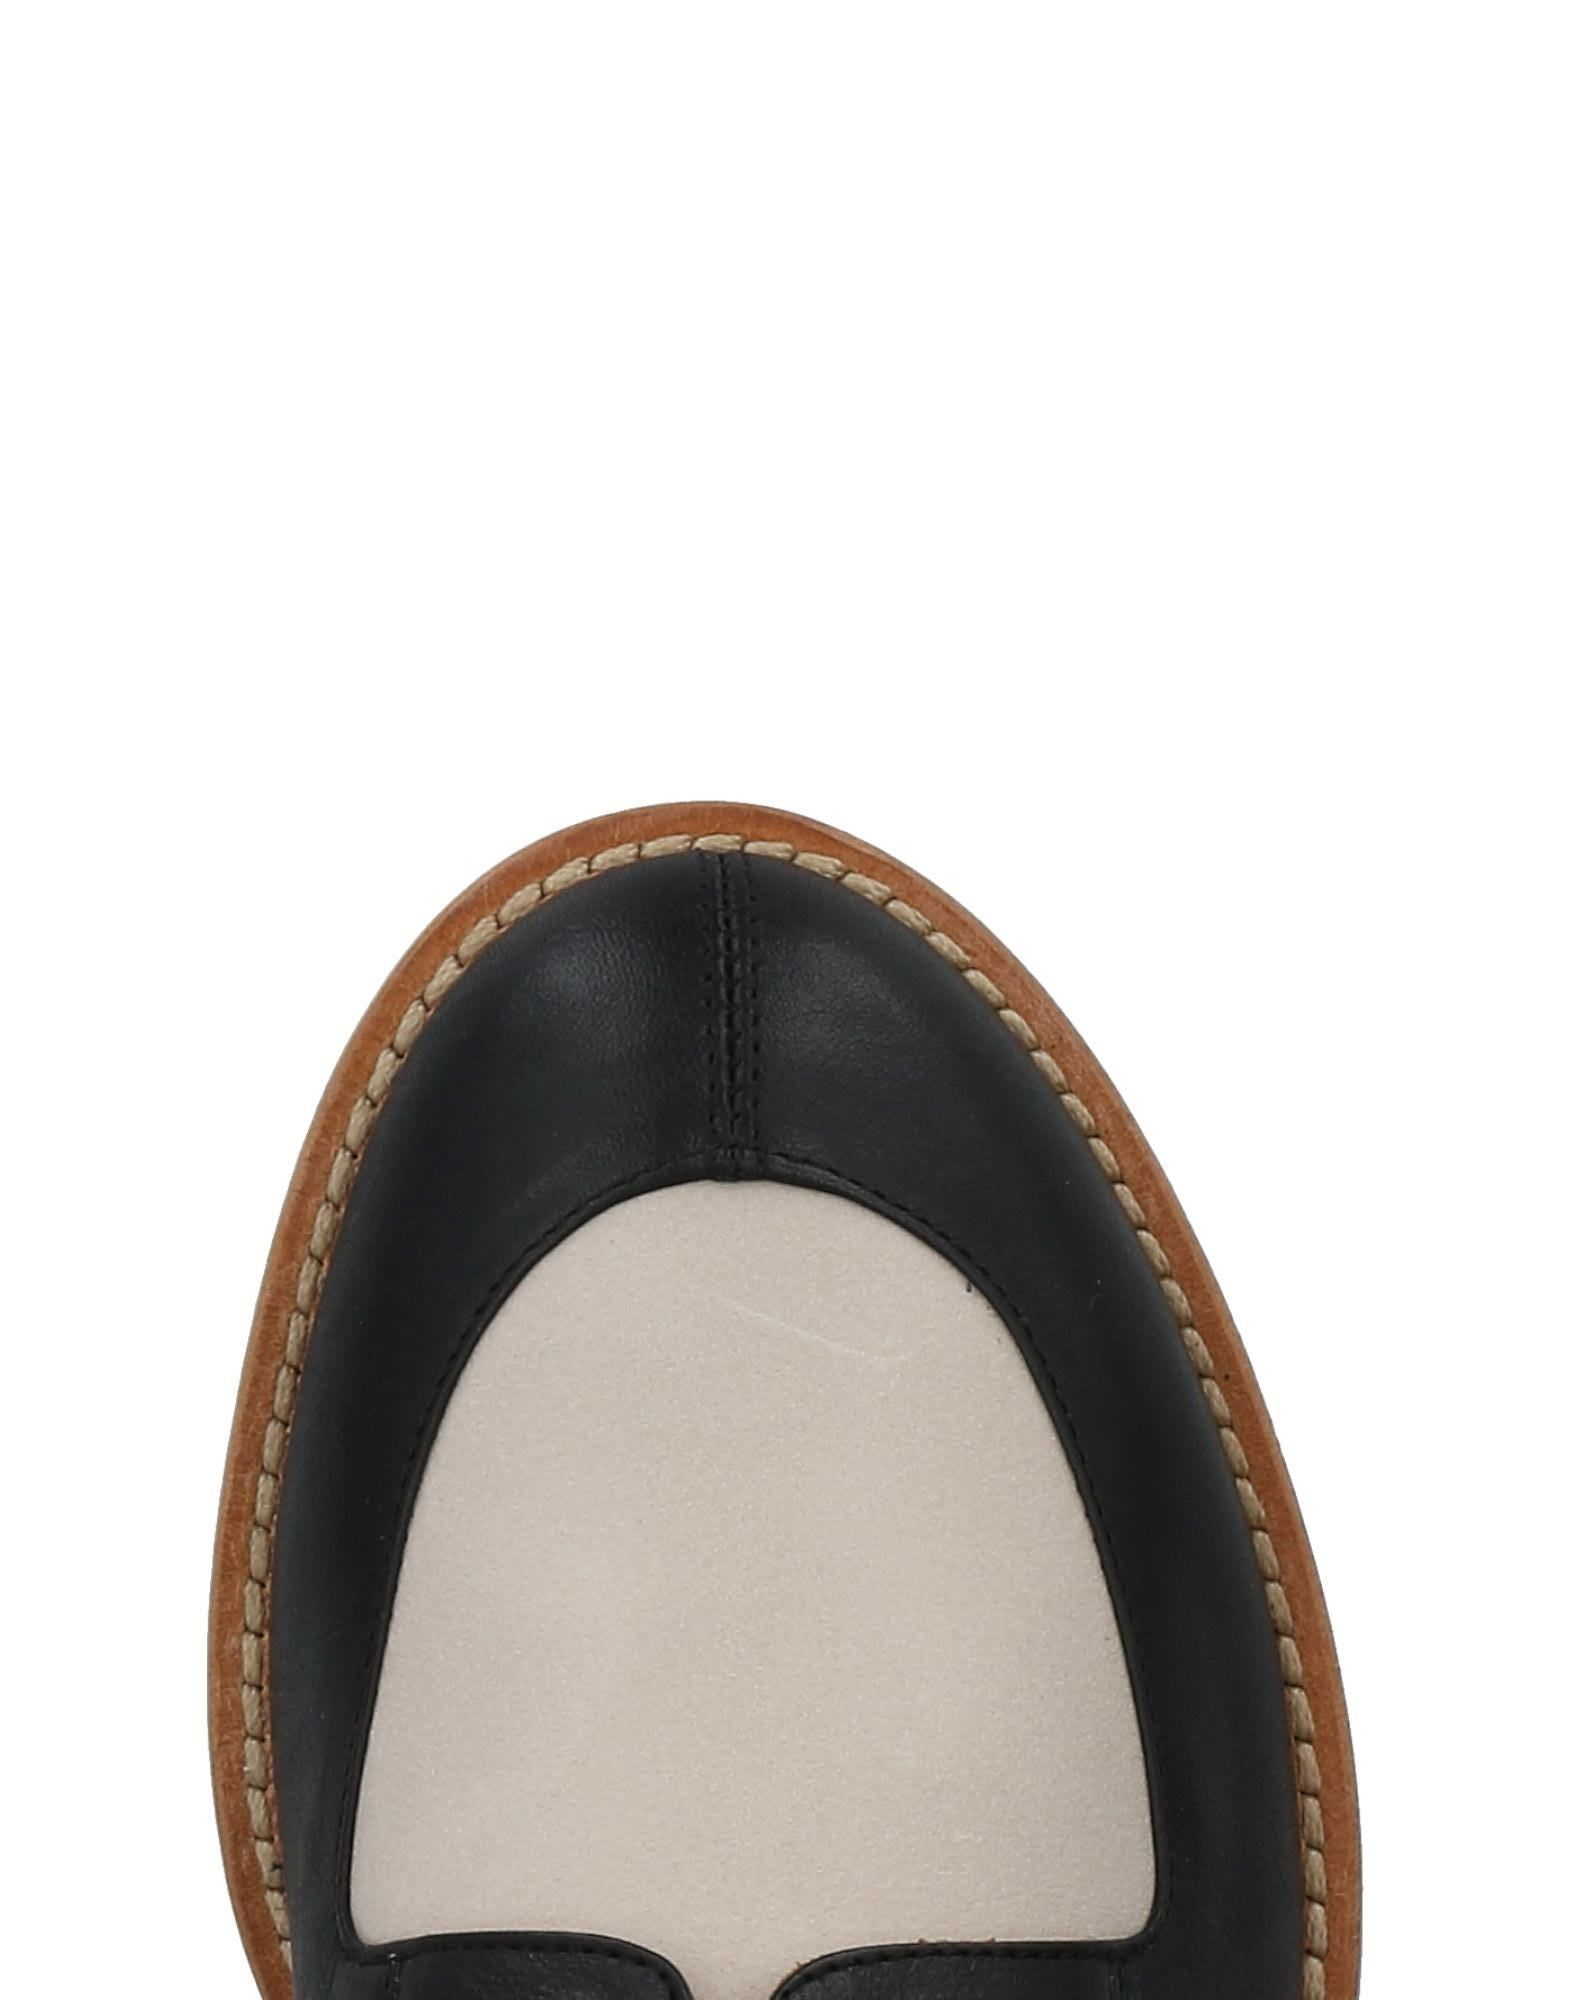 L'f Shoes Schnürschuhe  Herren  Schnürschuhe 11448927PF Neue Schuhe 09de18